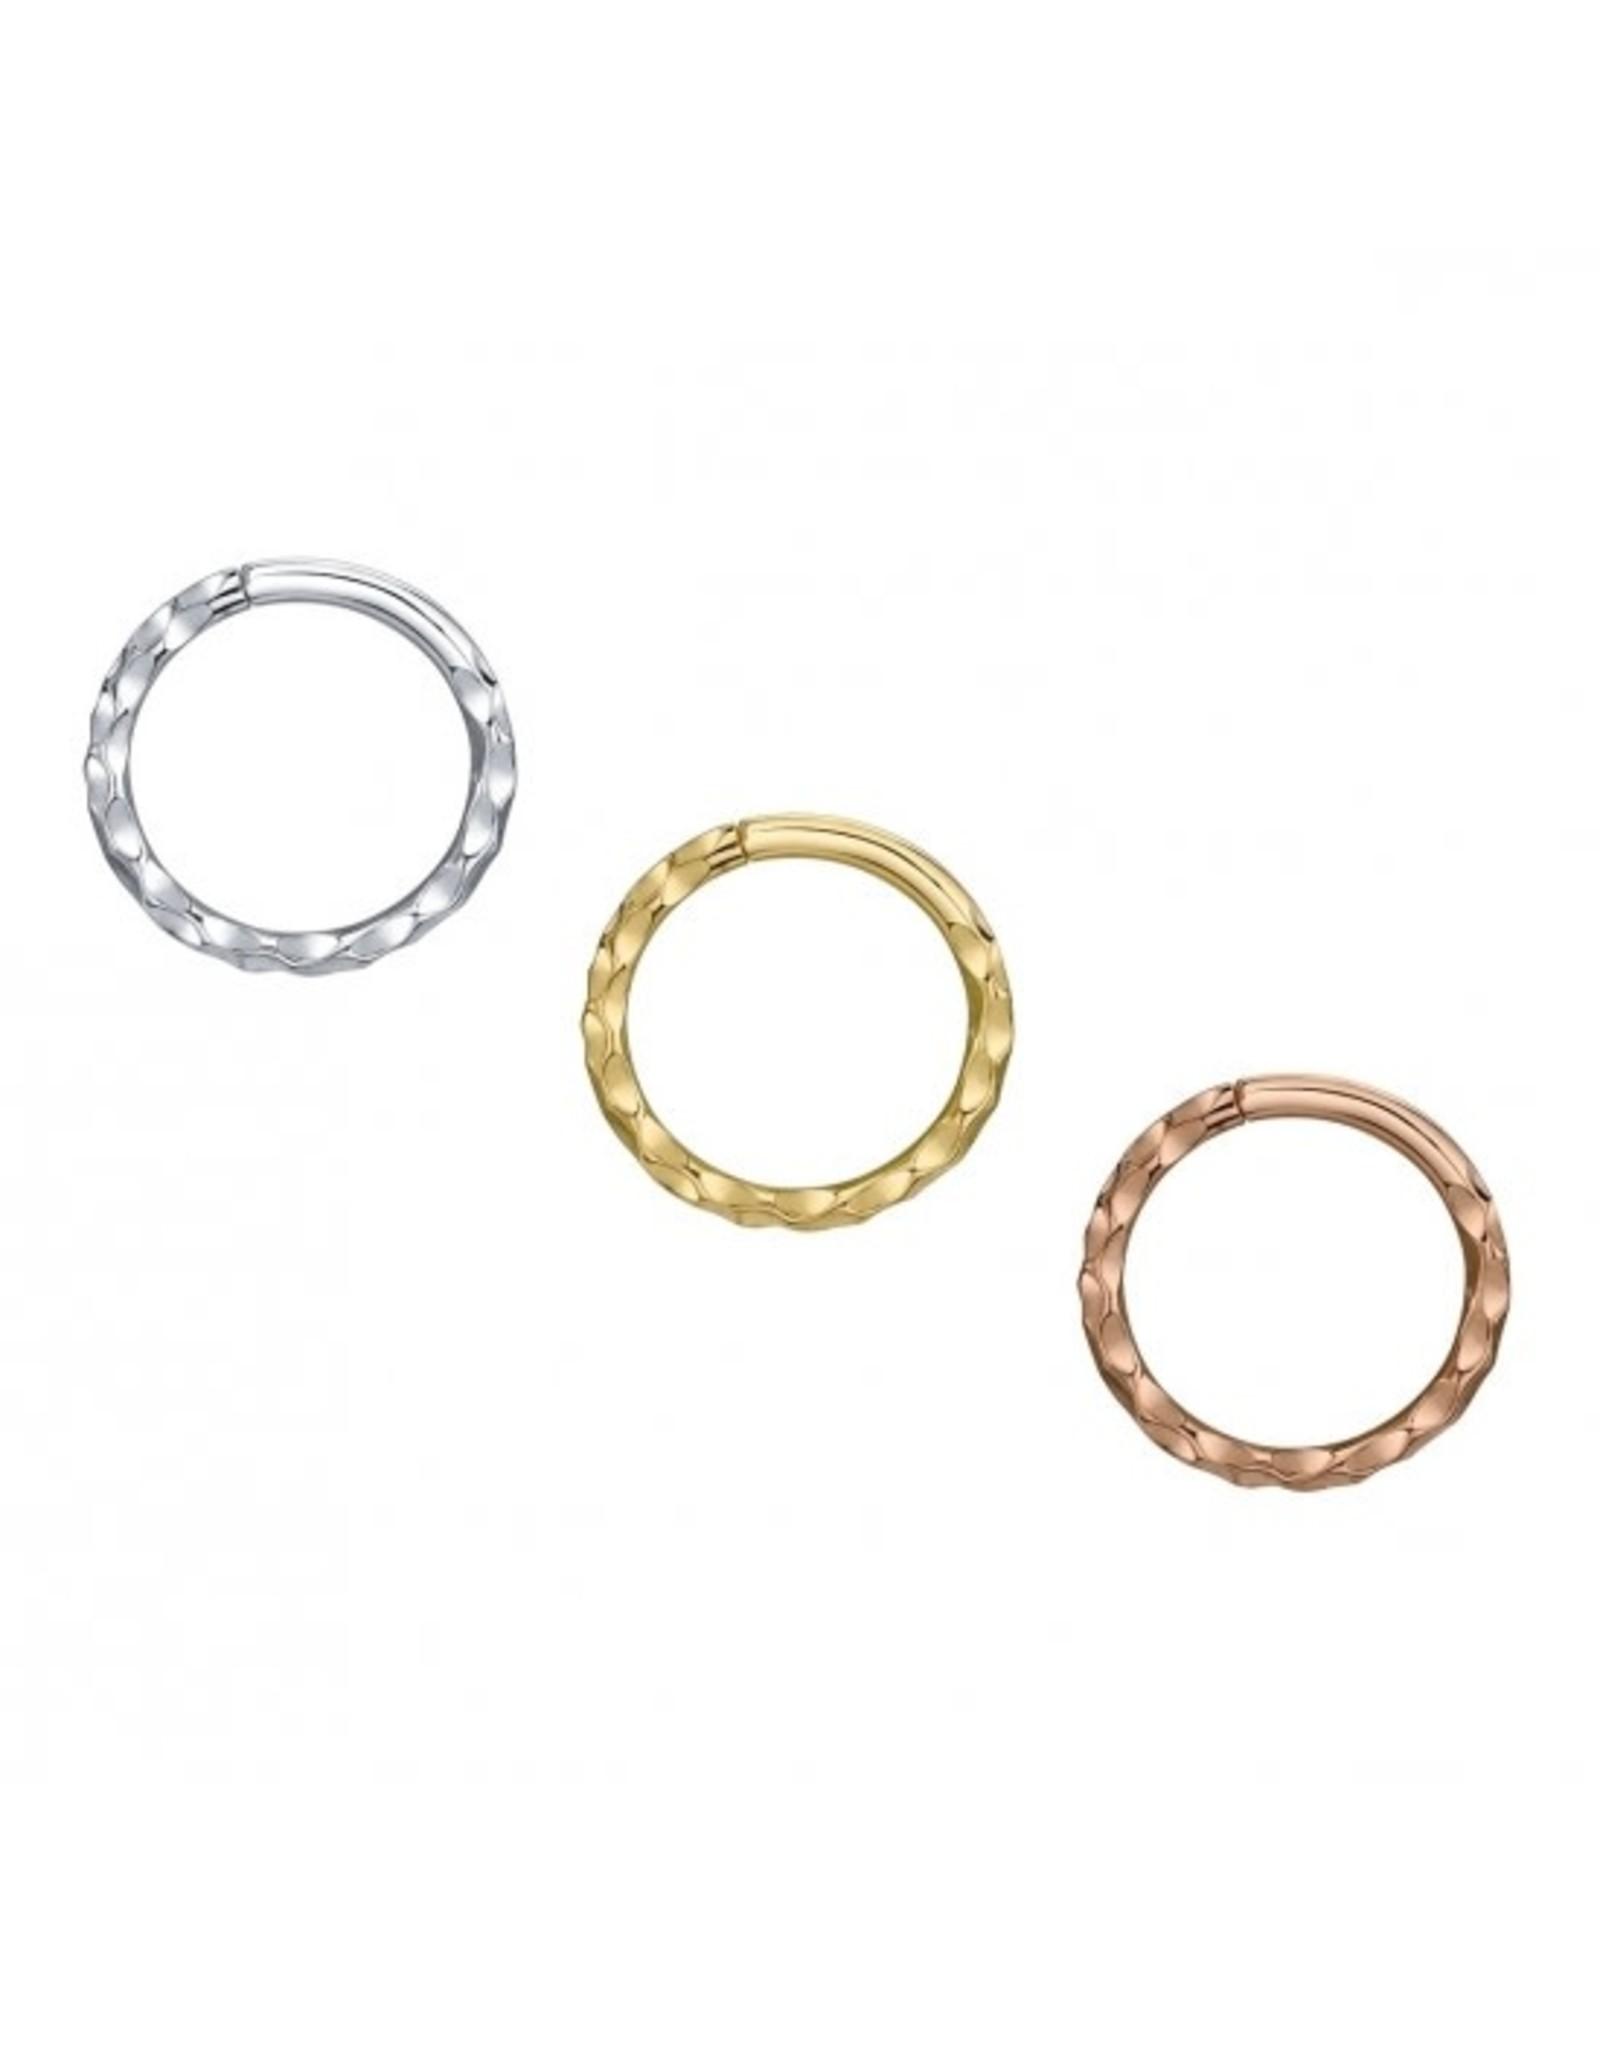 BVLA BVLA 16g Hammered Seam Ring